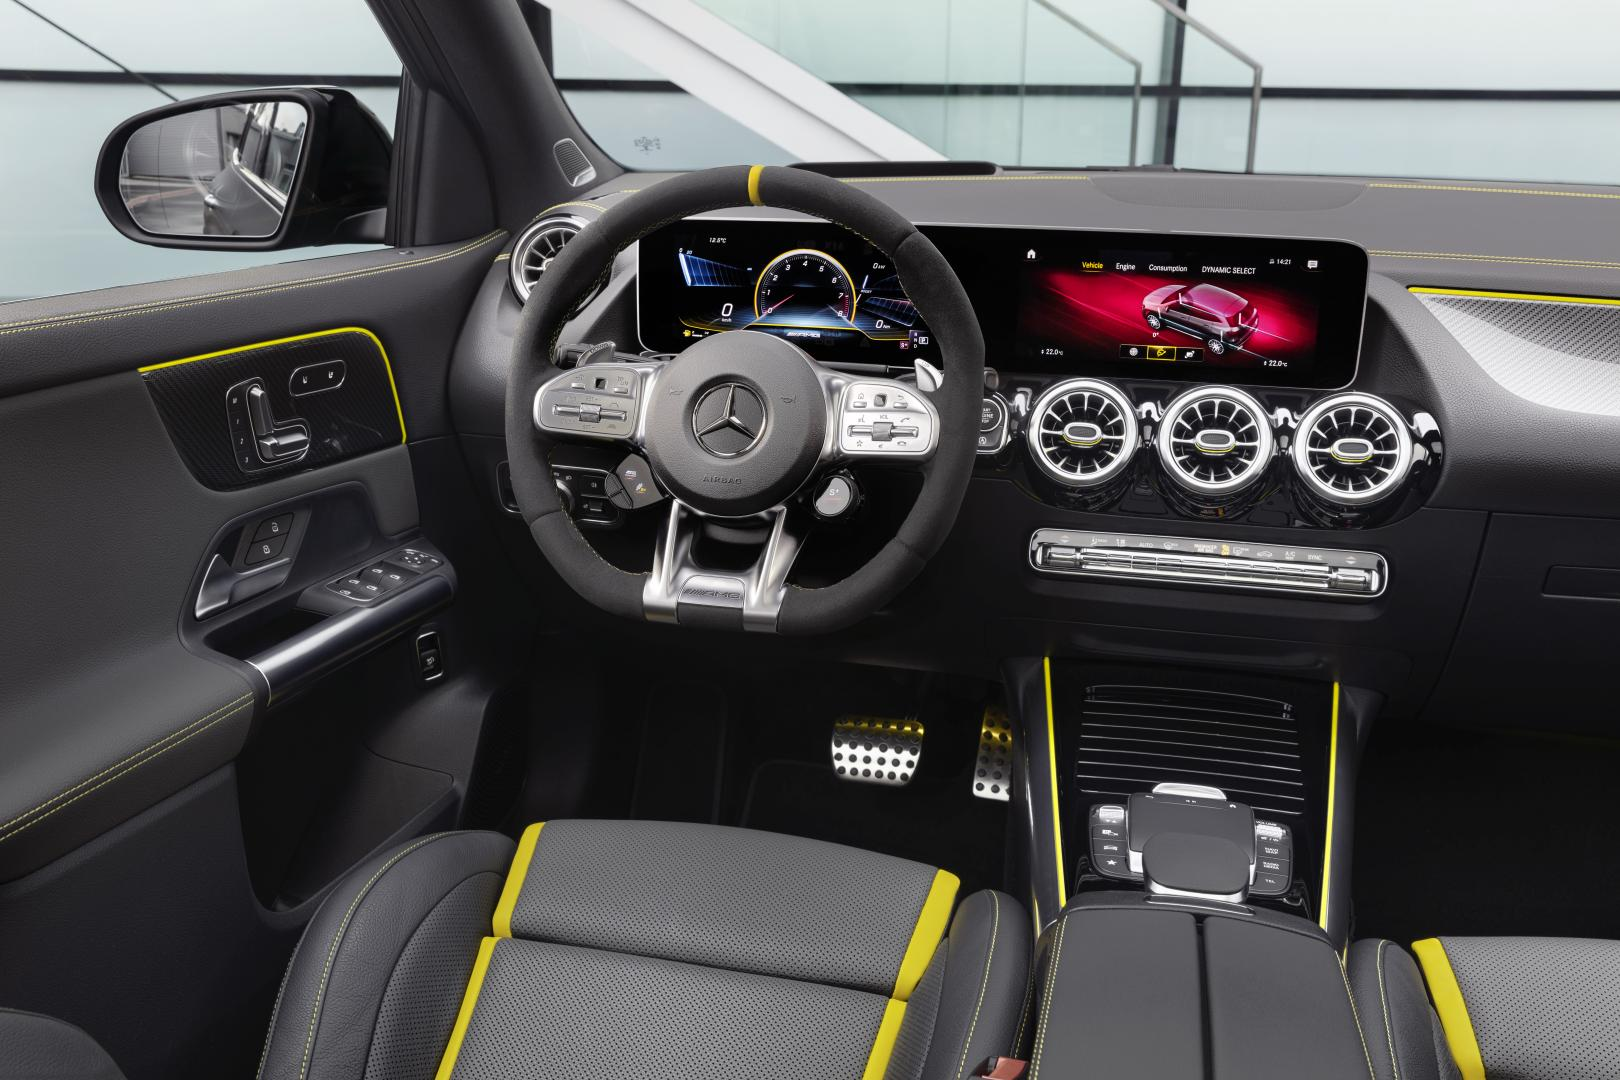 Mercedes-AMG GLA 45 S interieur dashboard